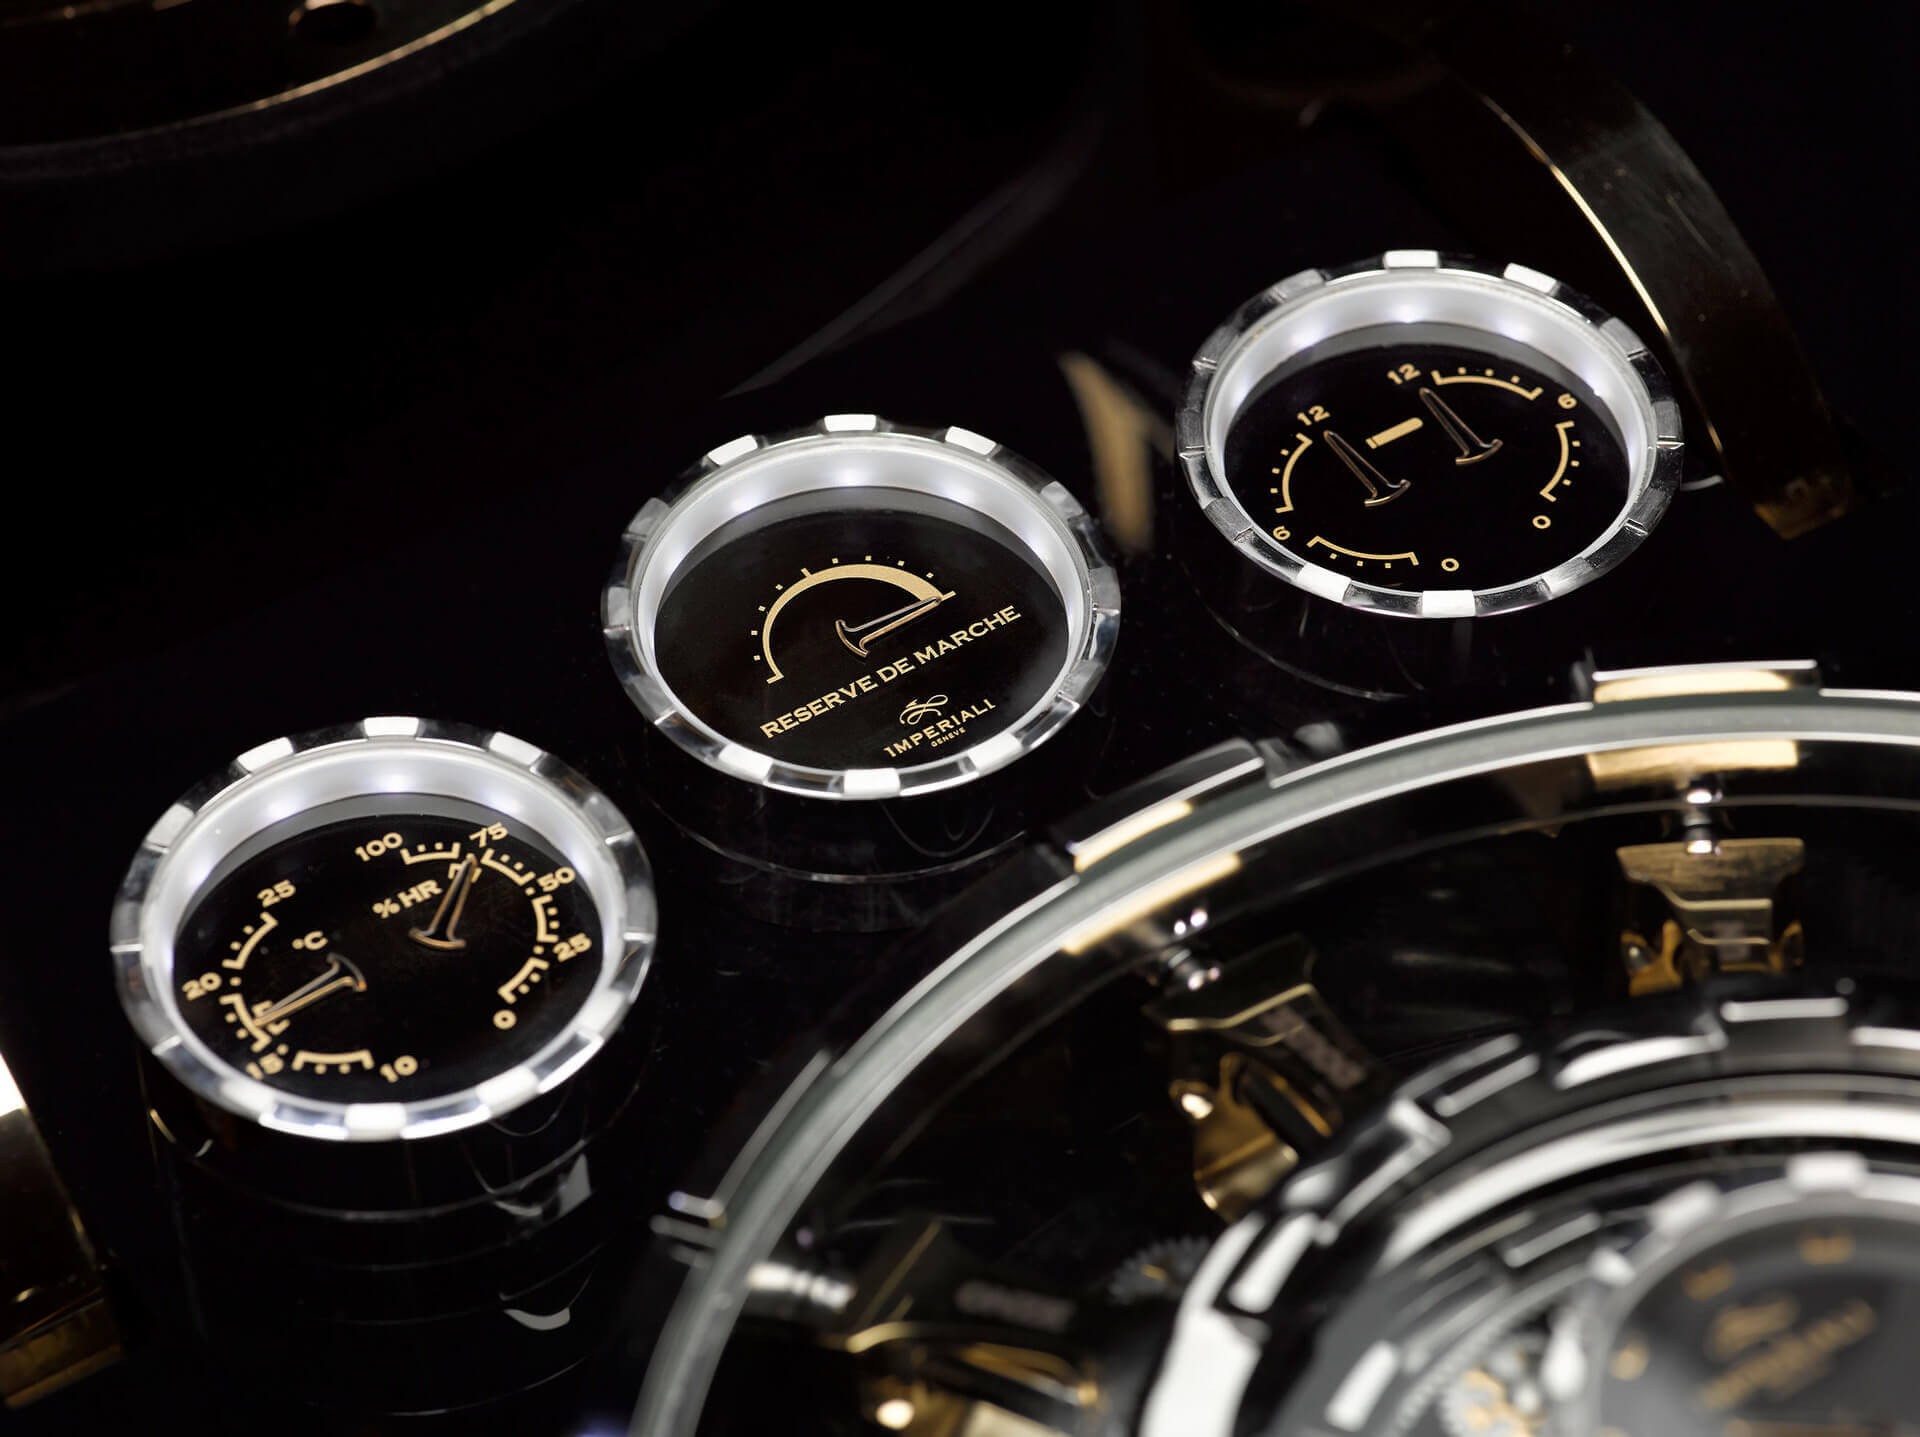 imperiali-geneve-emperador-cigares-cave-coupe-laser-tourbillon-luxe-design-horlogerie-effronté-06